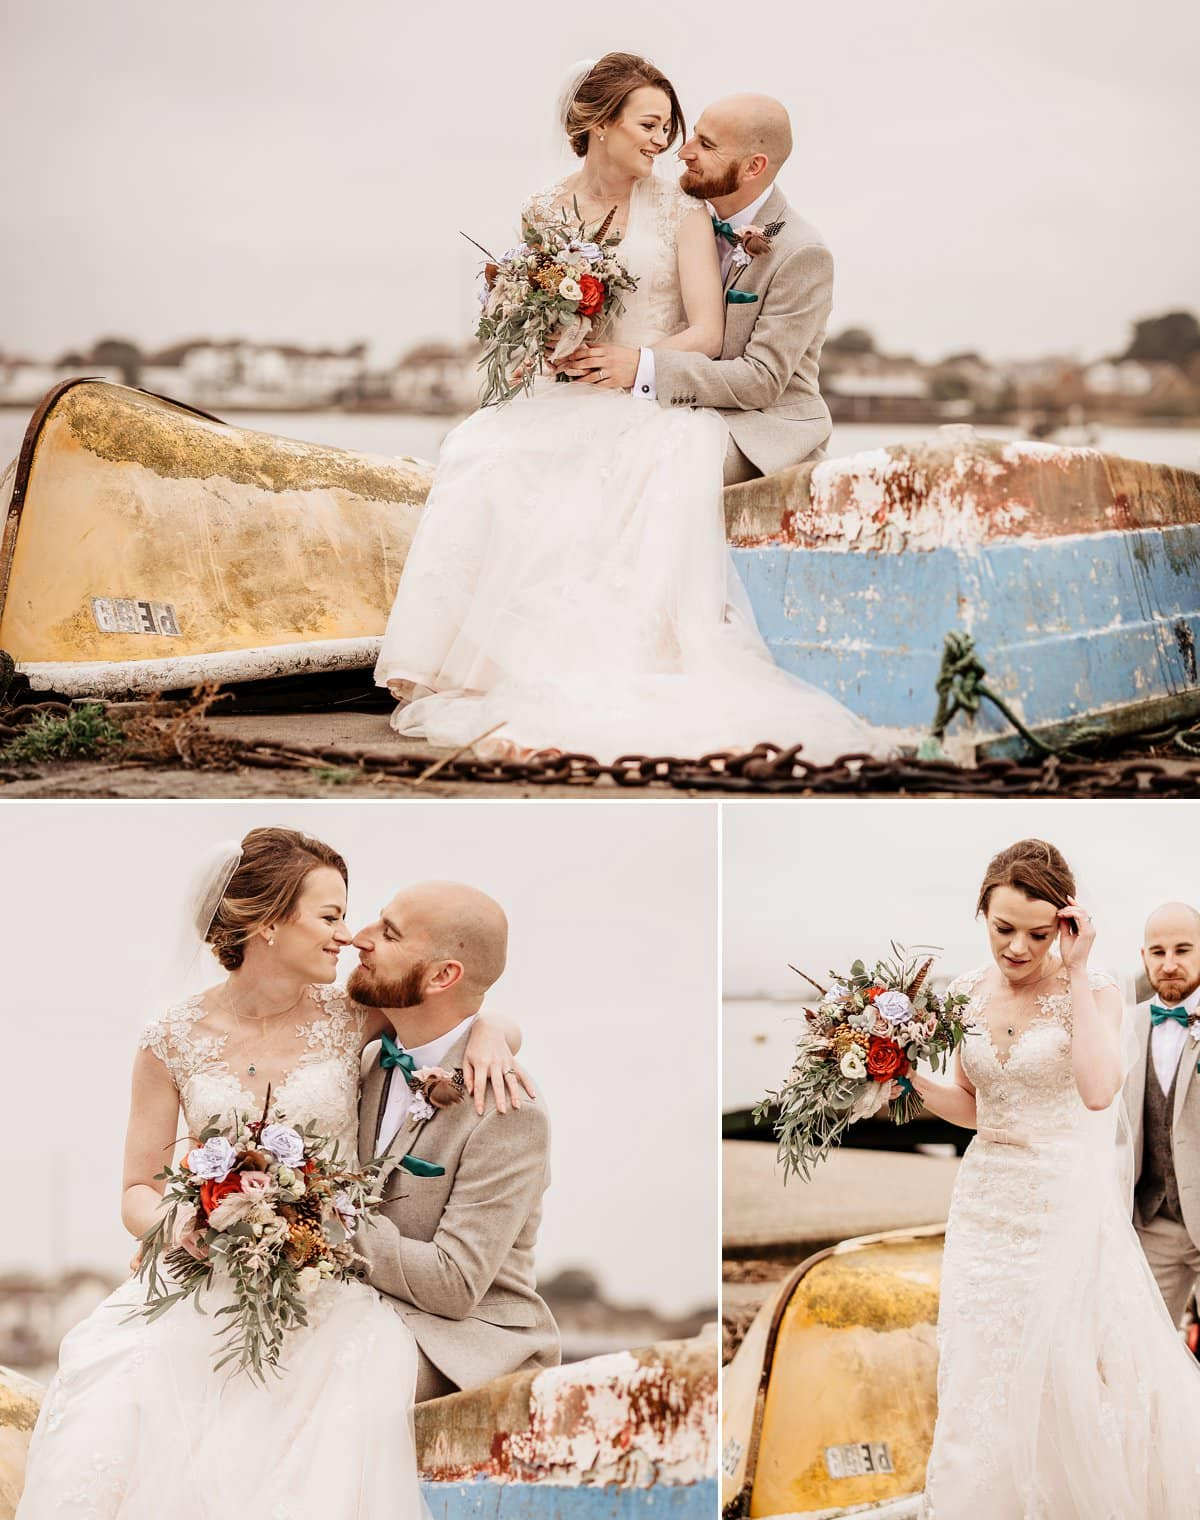 Wedding photoshoot on Mudeford Quay